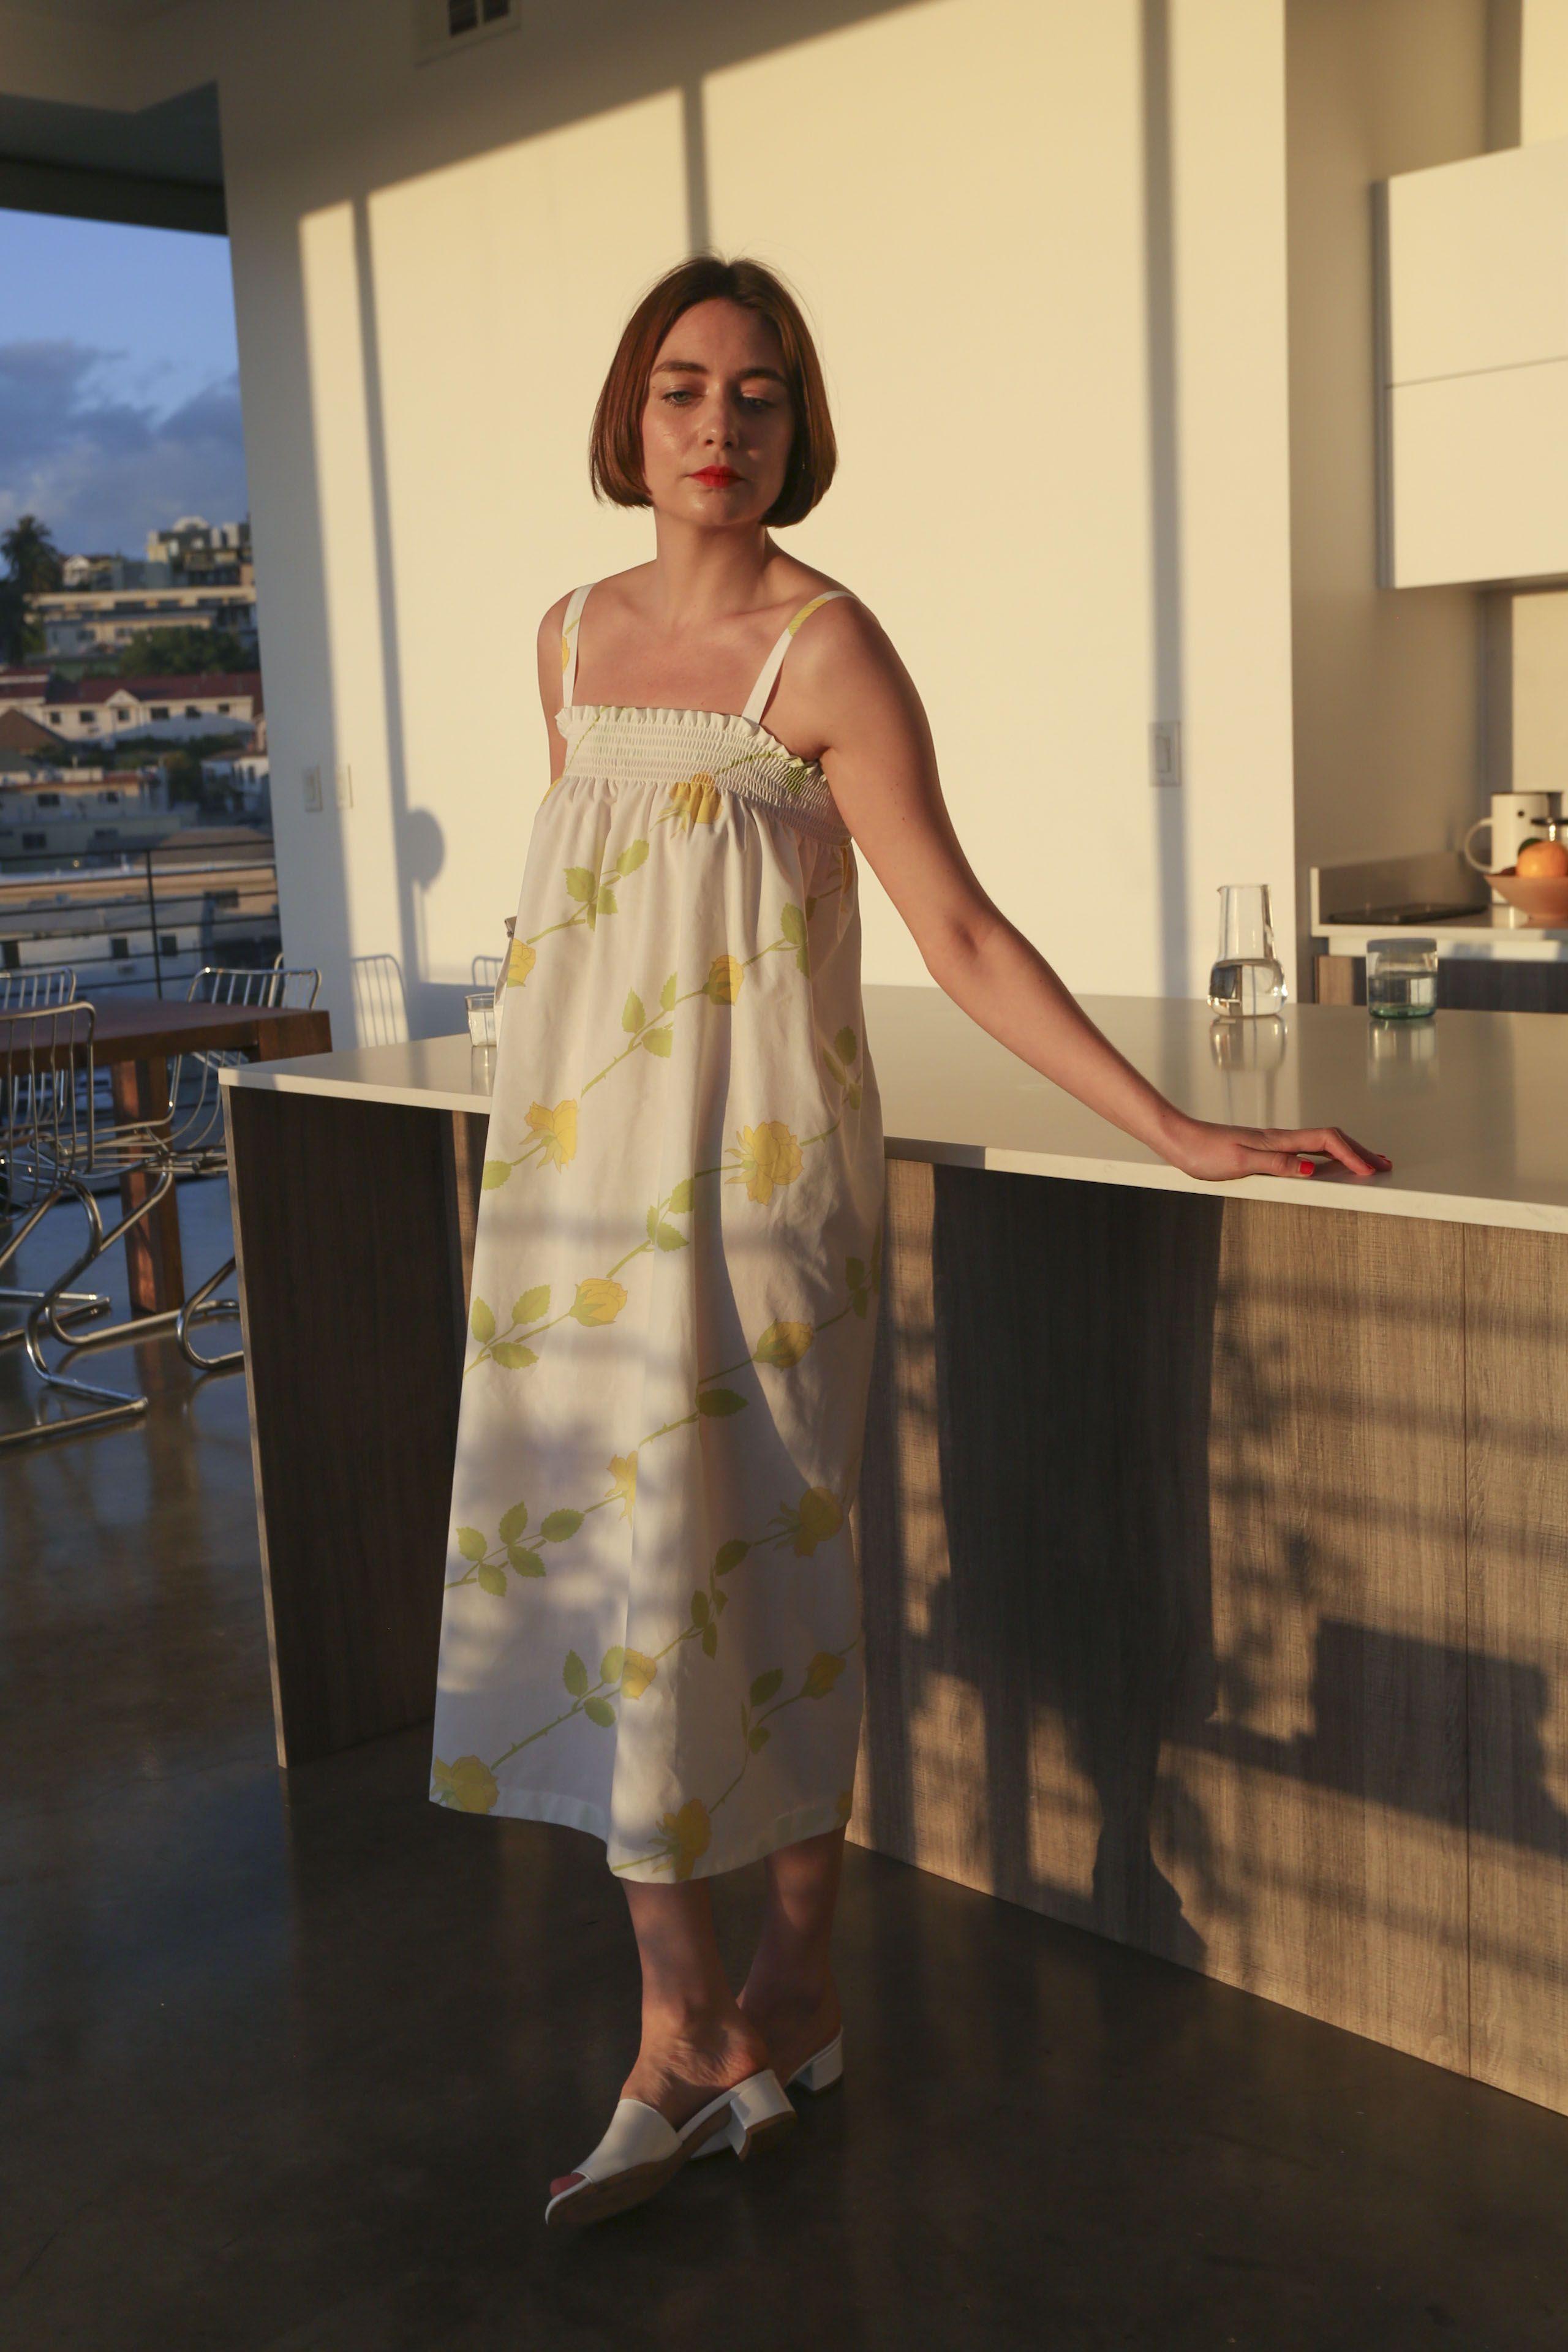 The Nonna Dress Dresses Summer Dresses Yellow Roses [ 3840 x 2560 Pixel ]